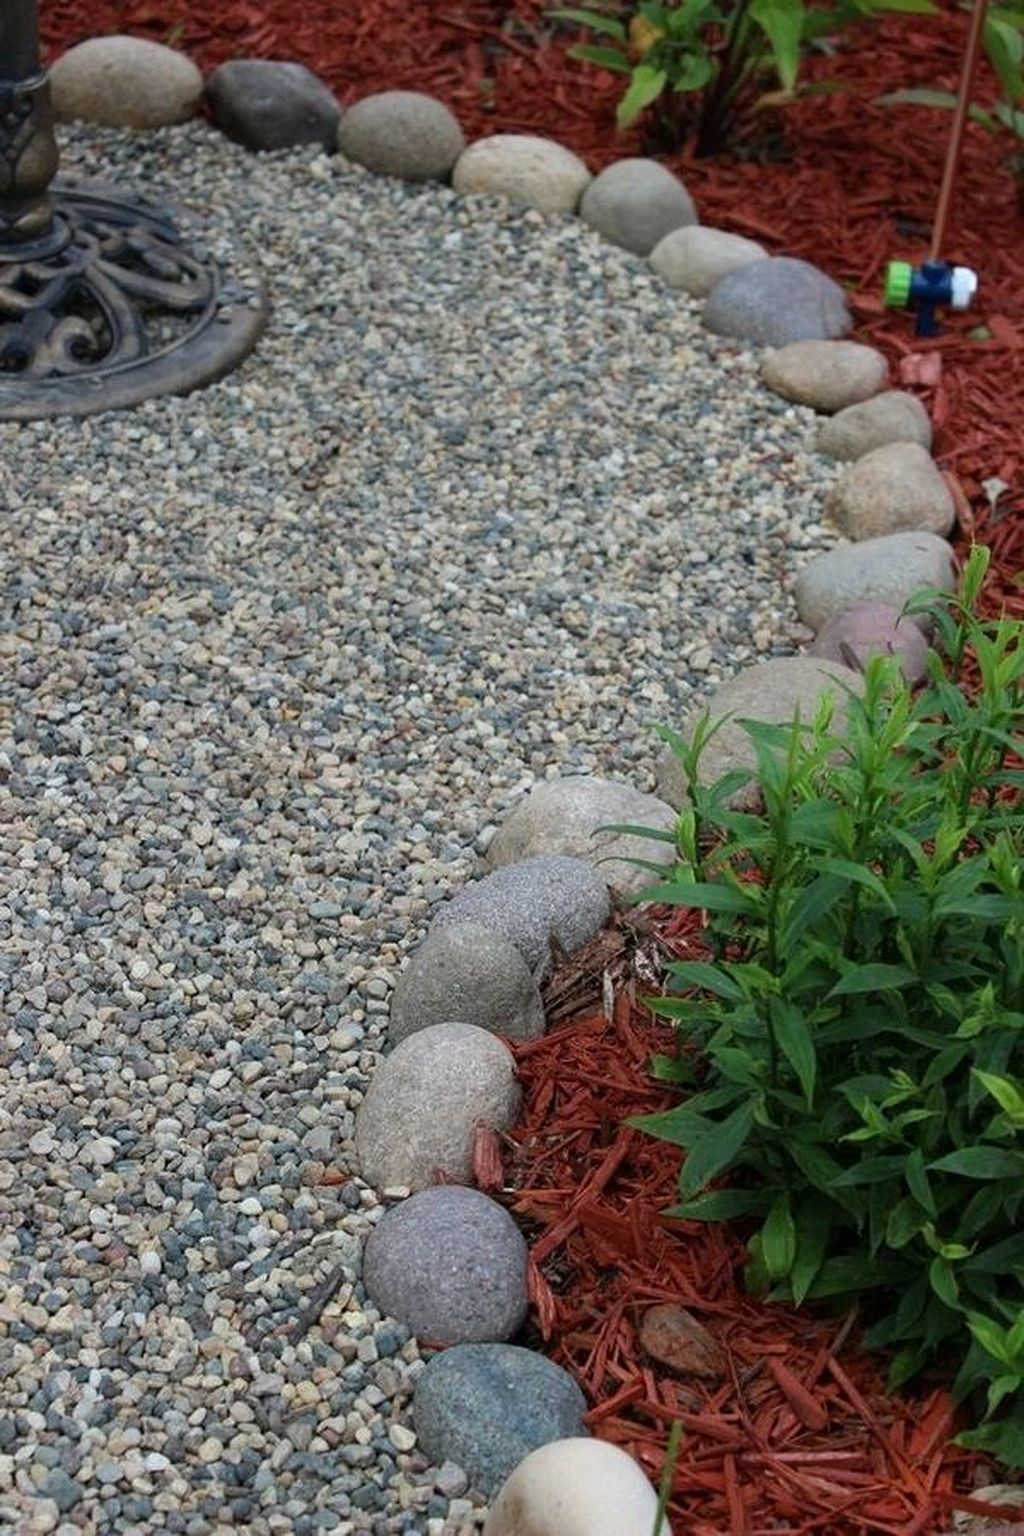 Great 30 Fancy Garden Decorating Ideas With Rocks And Stones Https Kidmagz Com 30 Fancy Garden Landscaping With Rocks Pebble Garden Rock Garden Landscaping